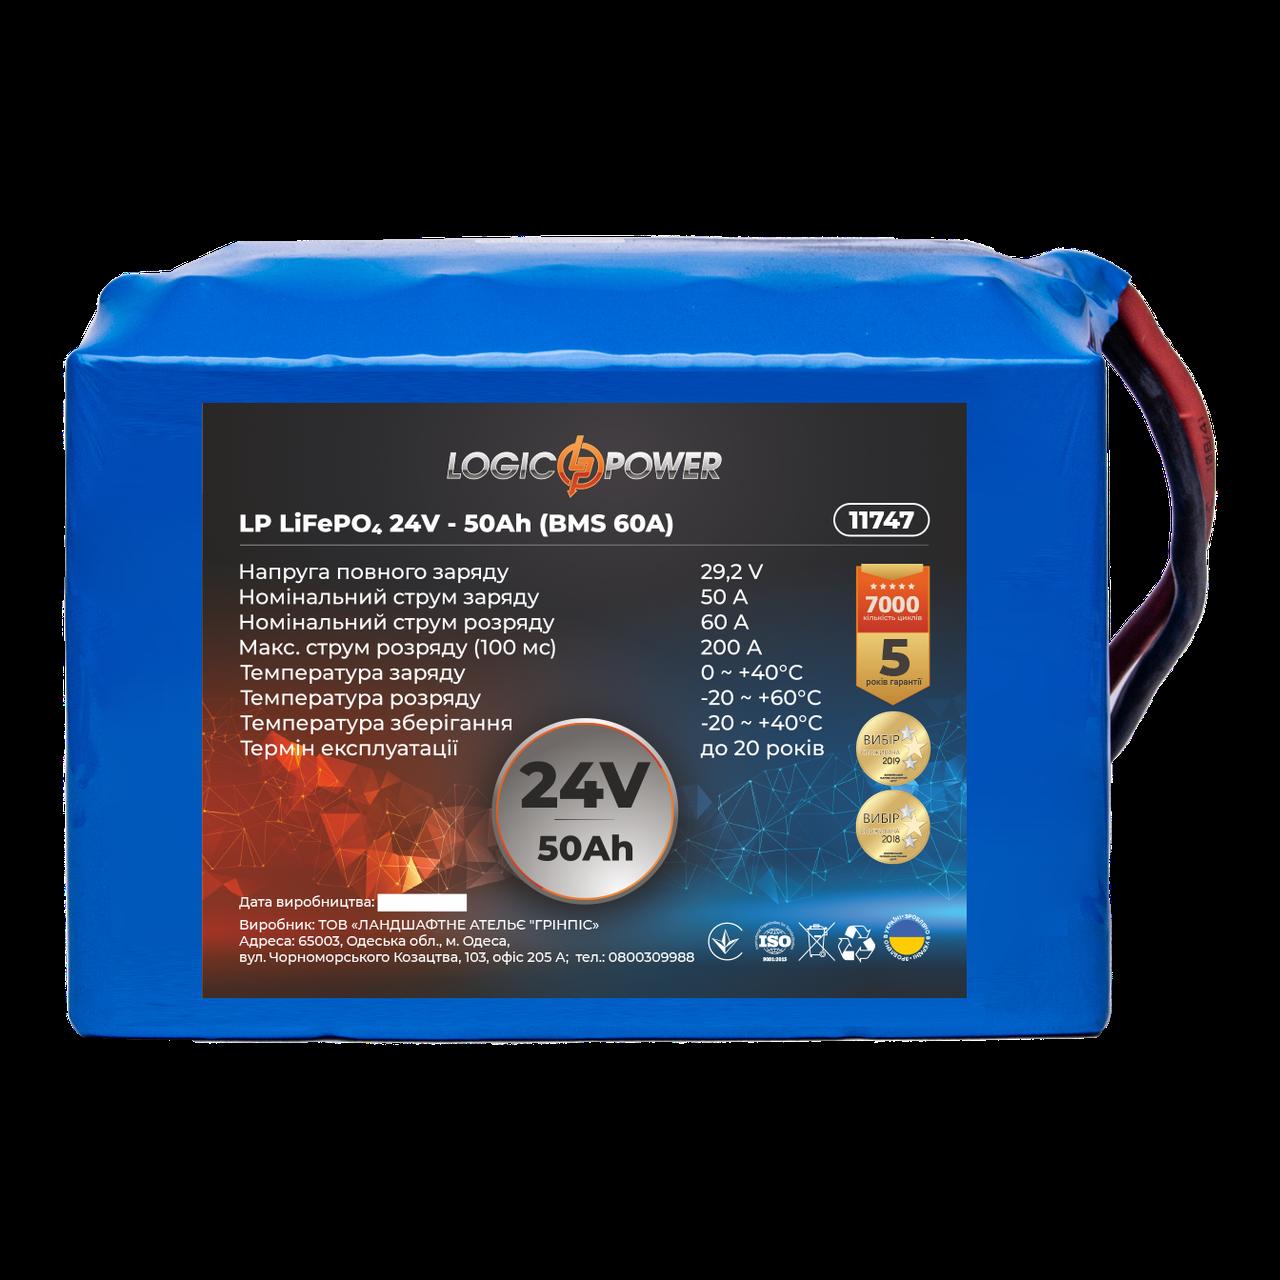 Акумулятор LP LiFePo-4 24 V - 50 Ah (BMS 60A)